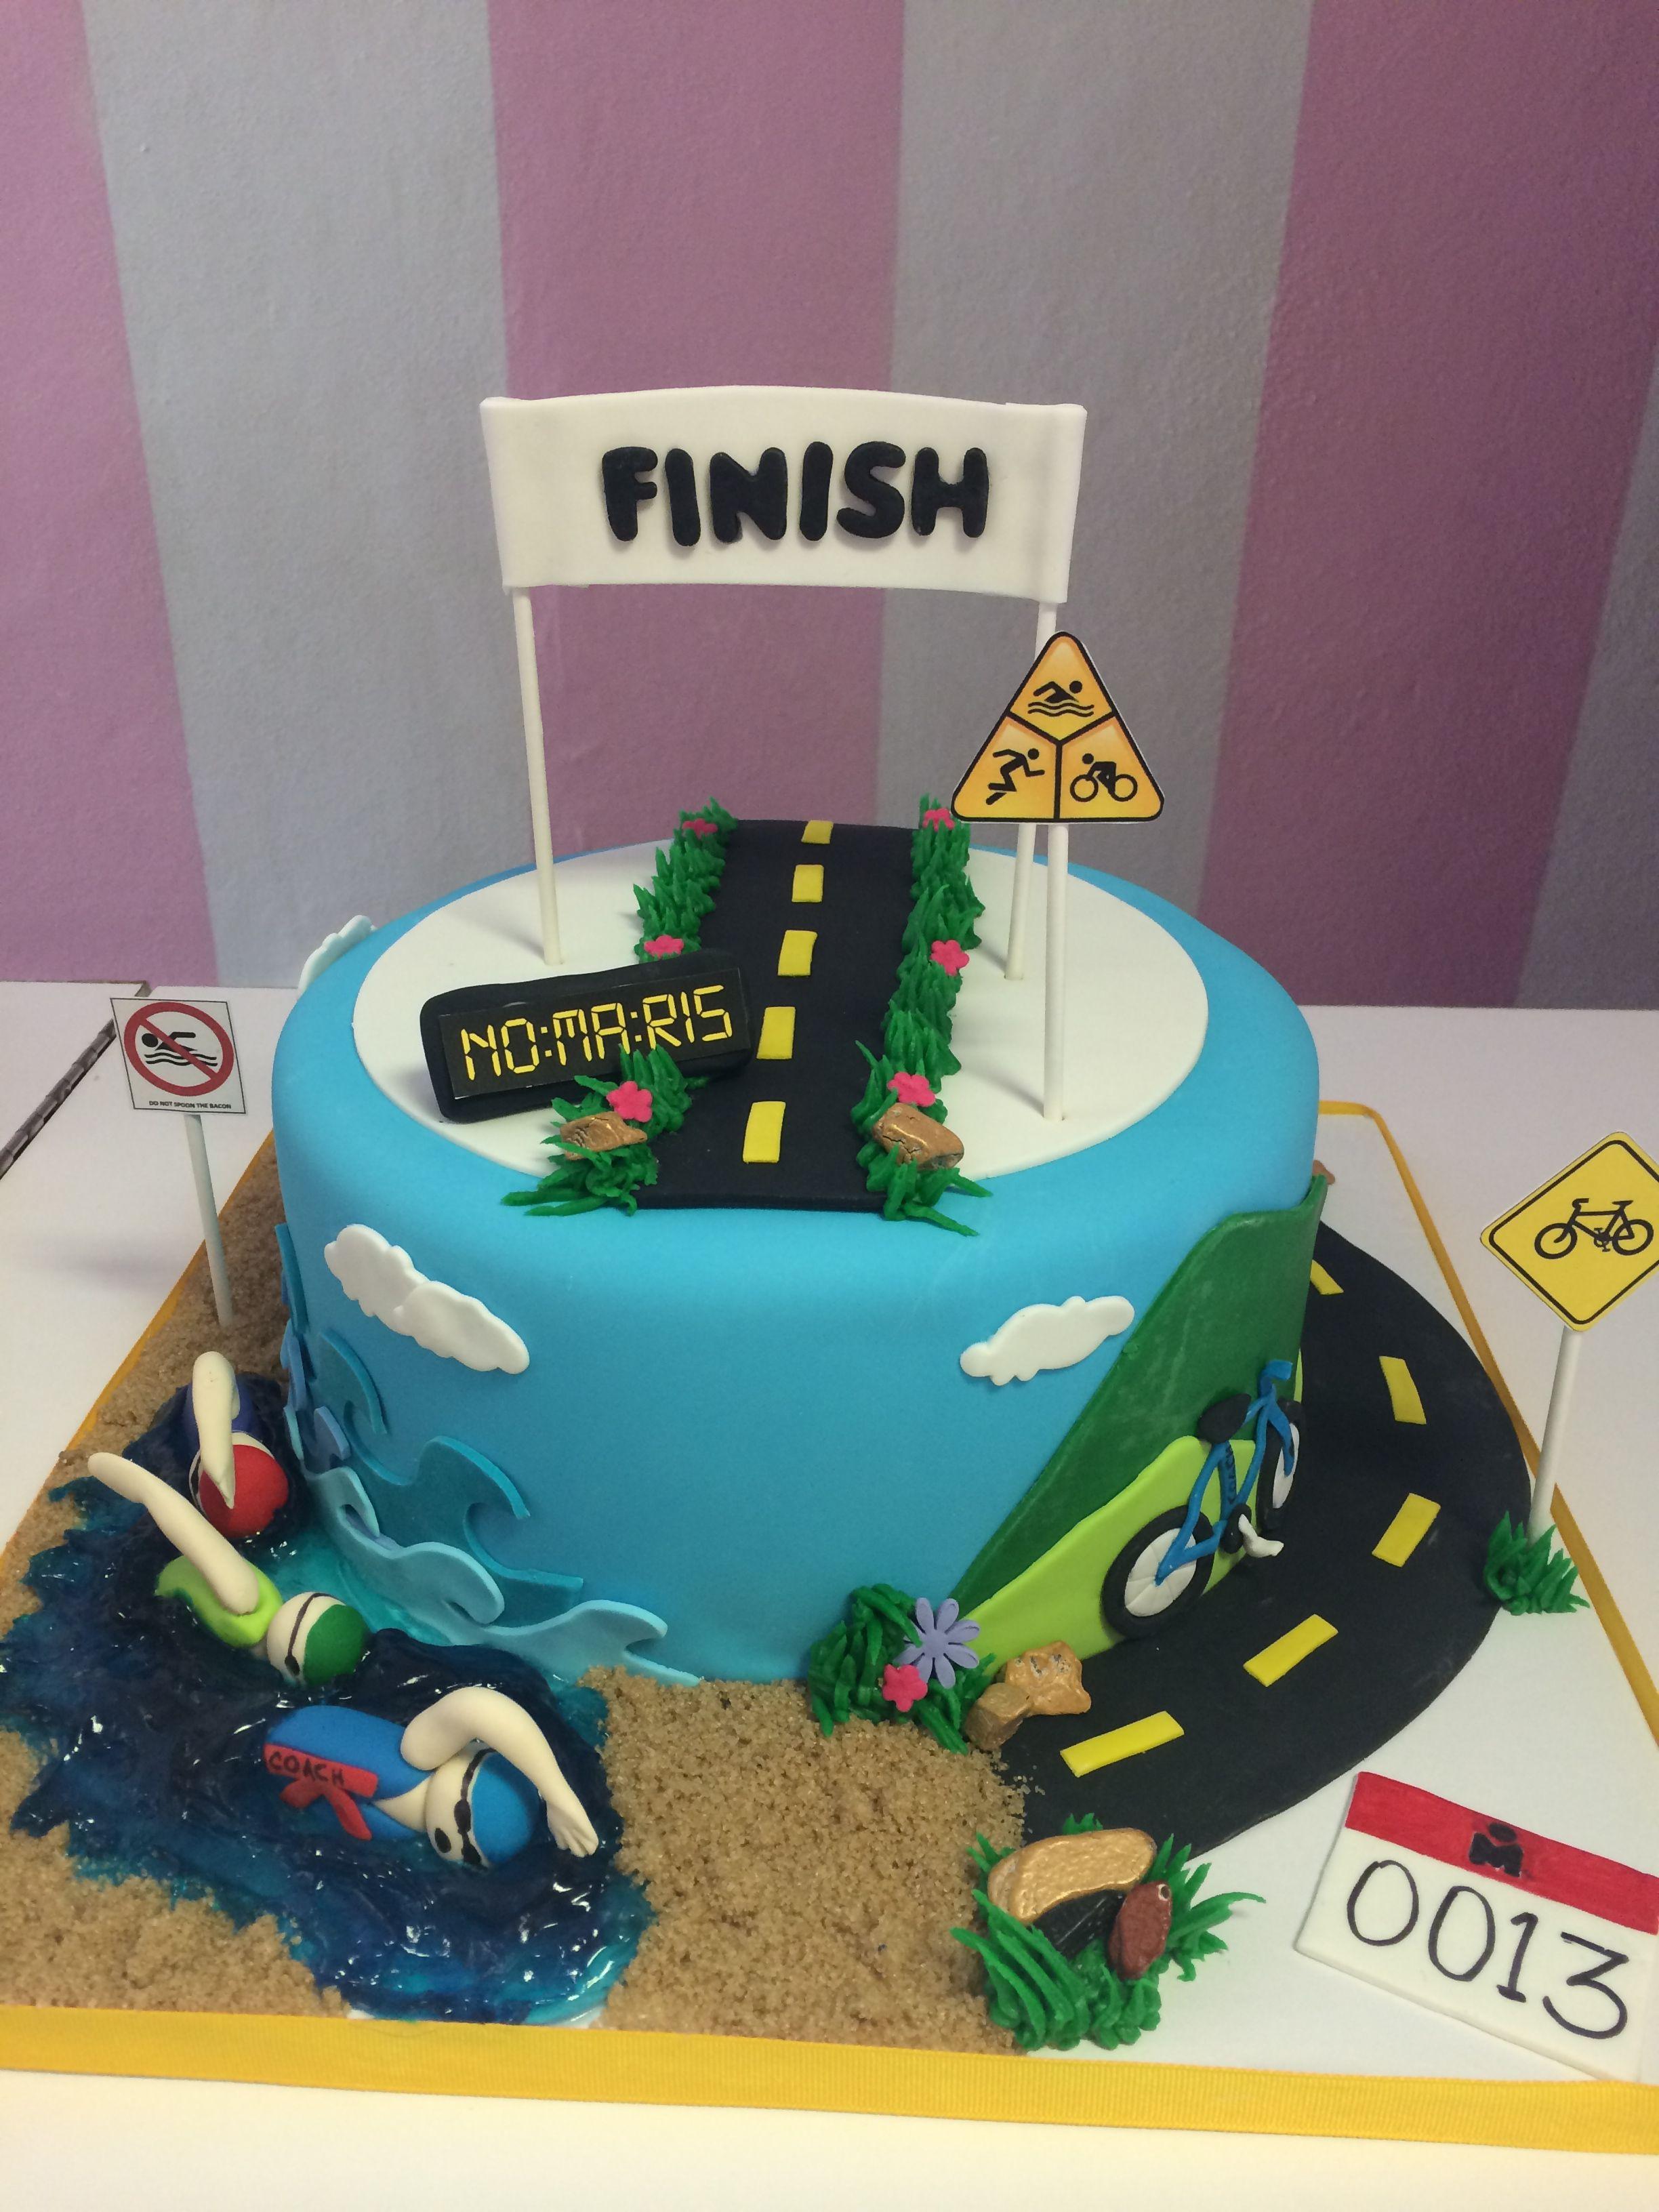 Triathlon Cake Sports Cake Ironman Cake Cake Decorating